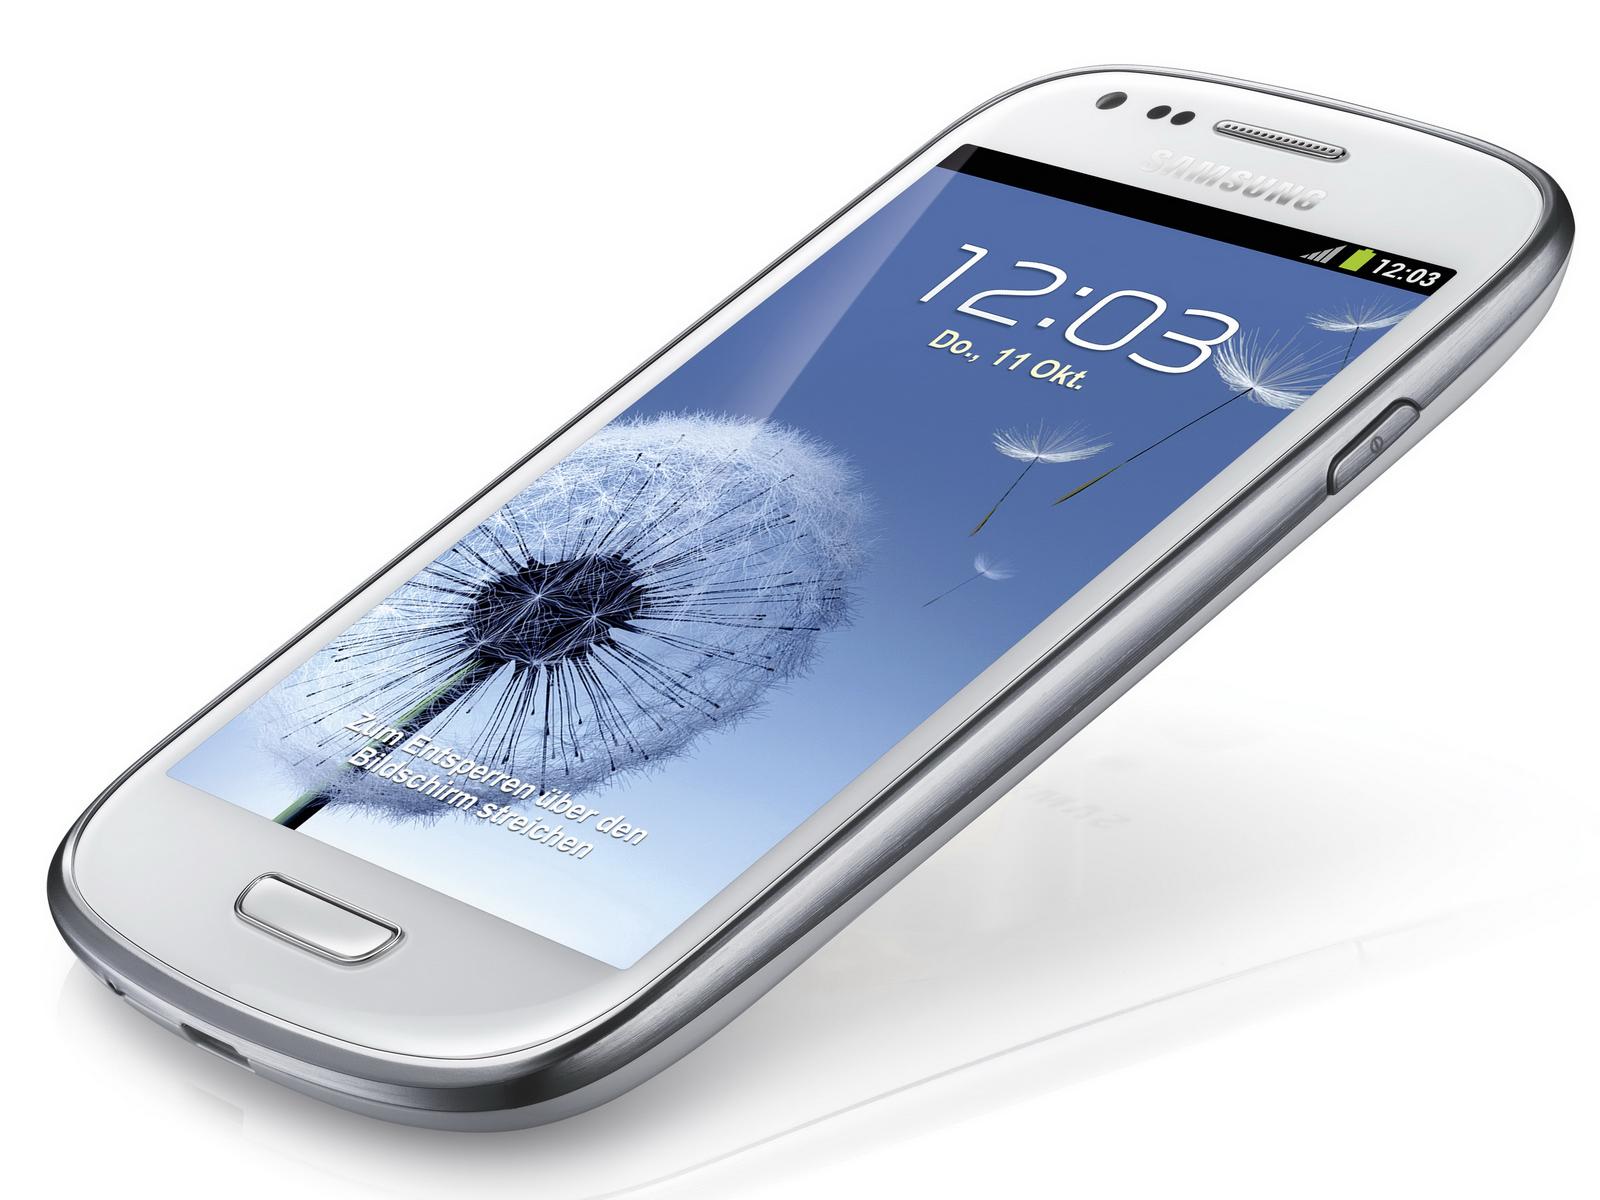 samsung smartphone galaxy s3 mini gt i8190 ab kw 48 news. Black Bedroom Furniture Sets. Home Design Ideas